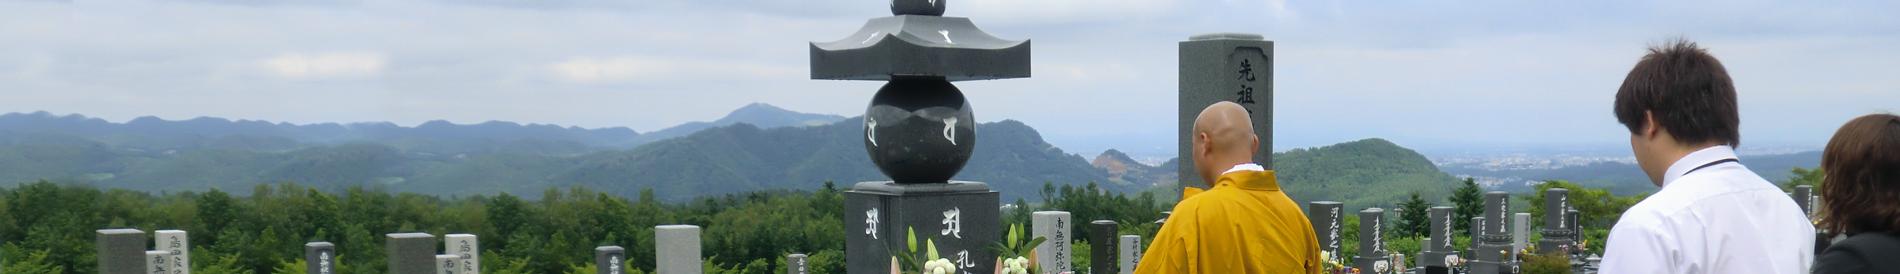 permanent-memorial-tomb